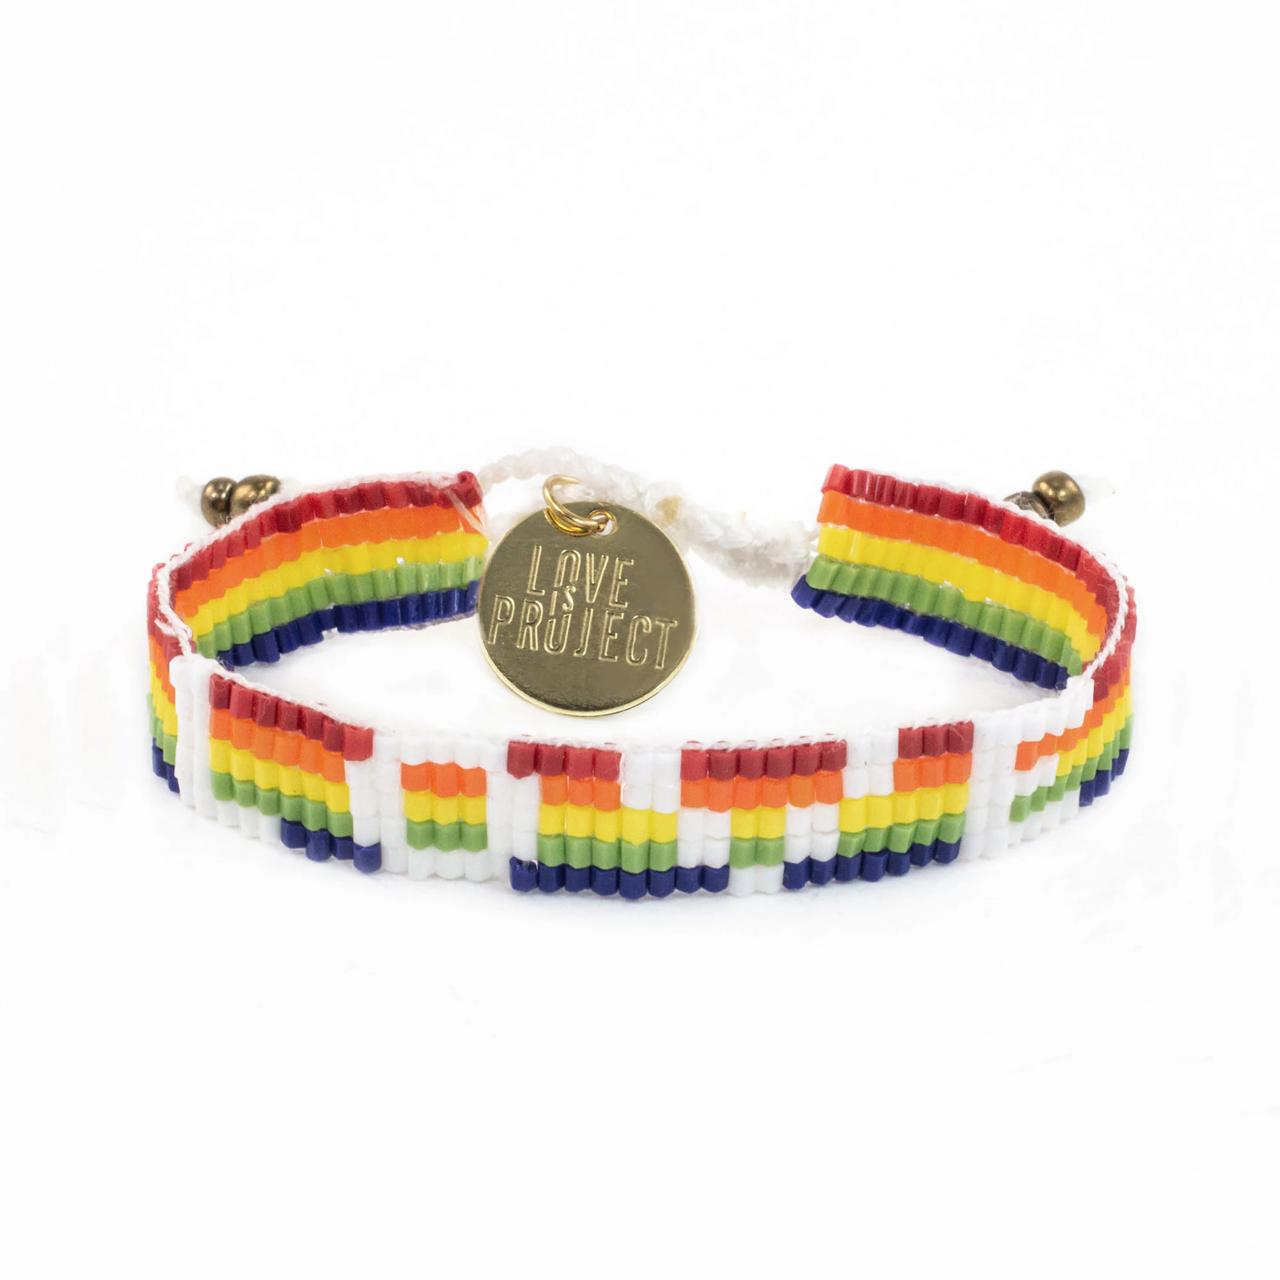 Love is Project Seed Bead Love Bracelet - Rainbow